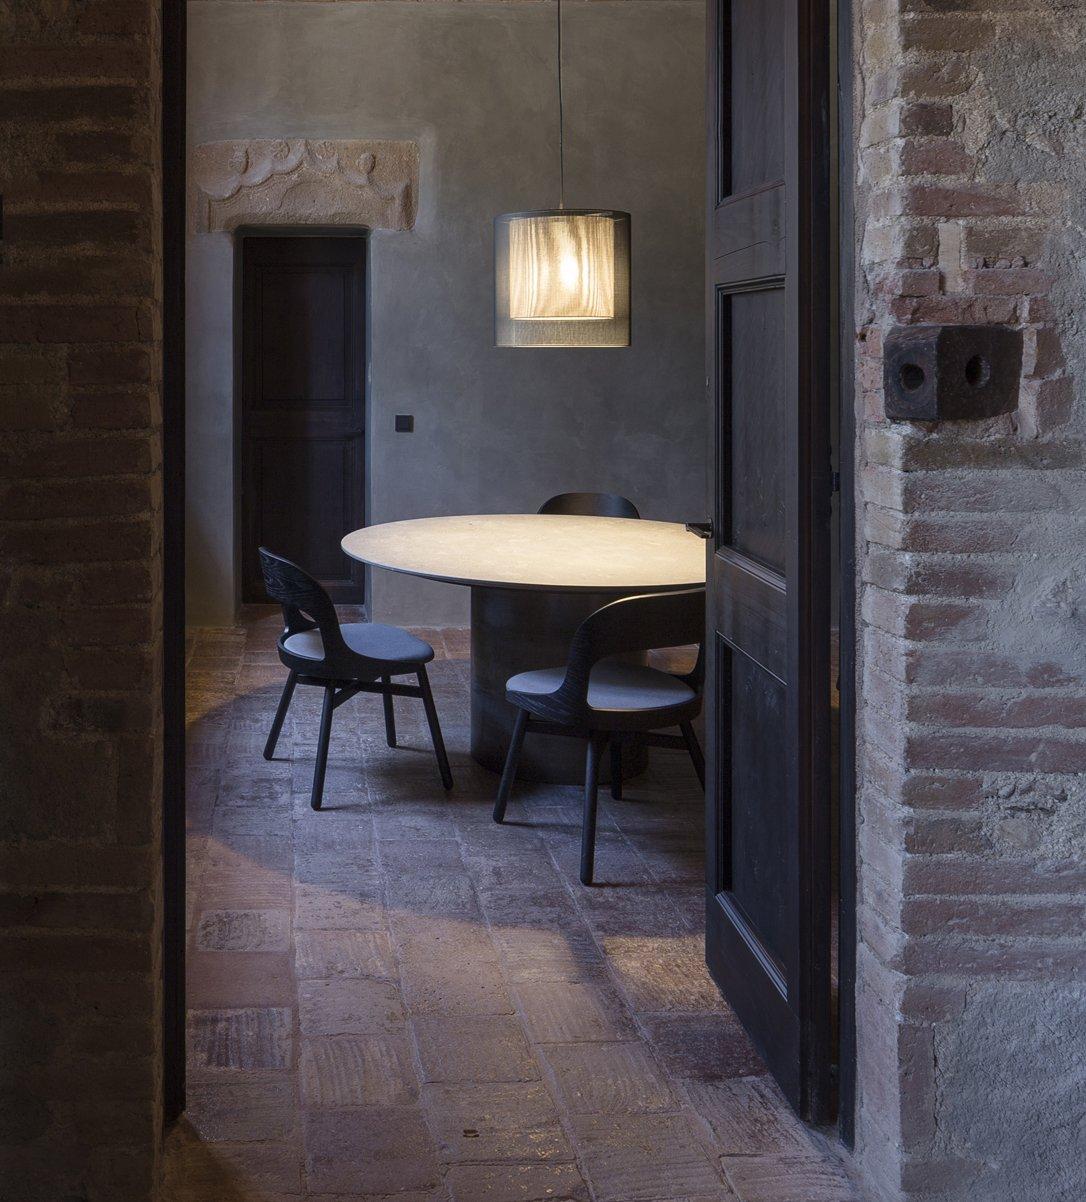 Dining Room, Pendant Lighting, Chair, Table, Lamps, and Ceramic Tile Floor  Sant Martí House by Francesc Rifé Studio